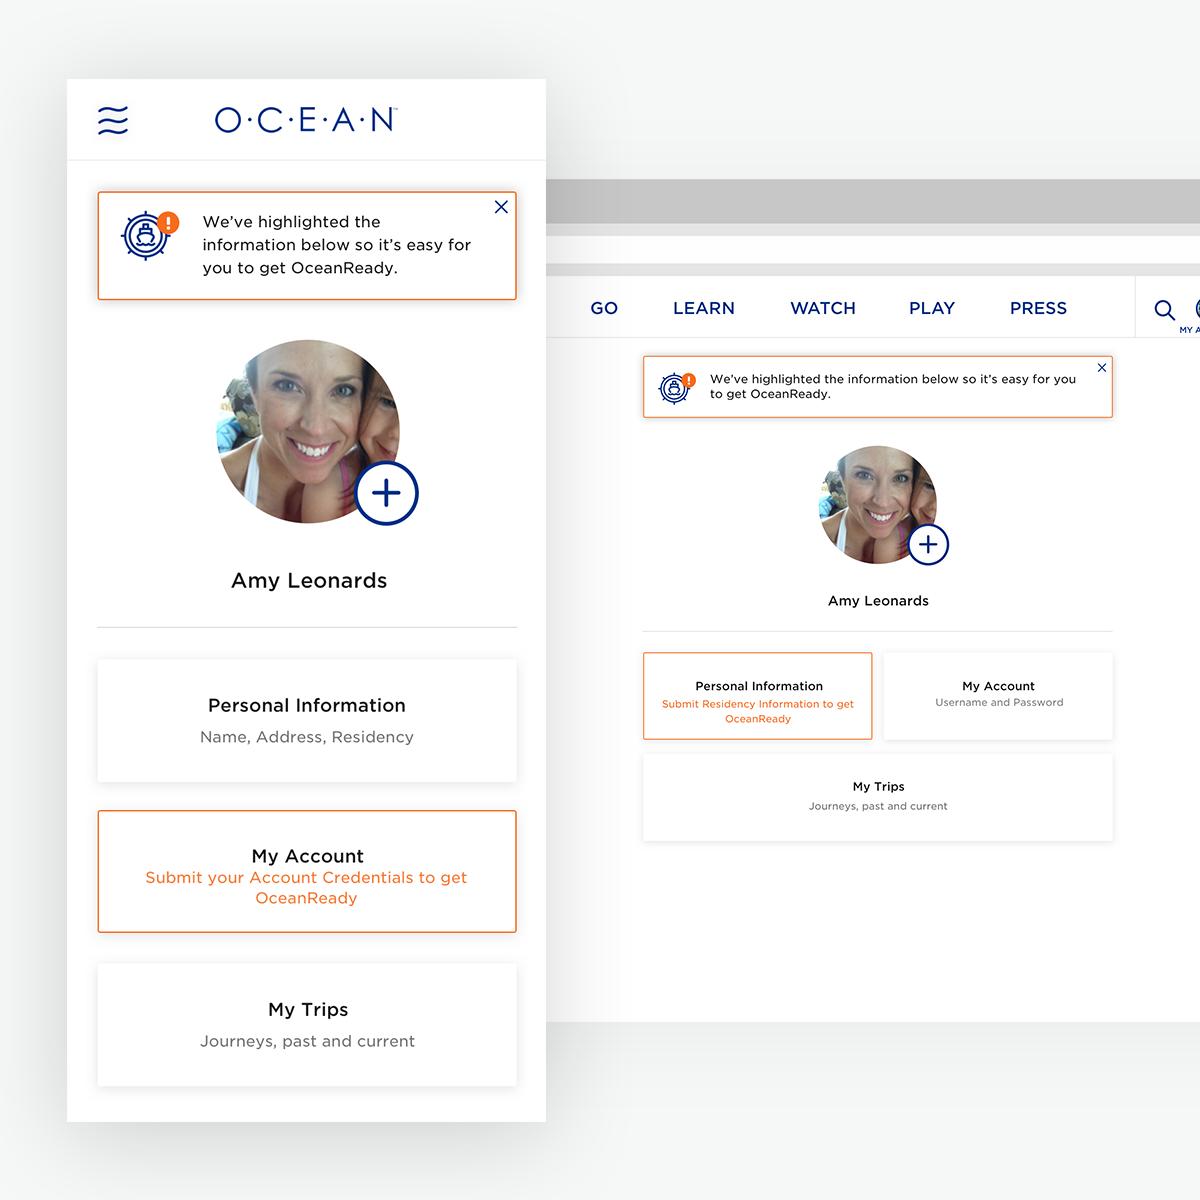 Profile for OCEAN.com